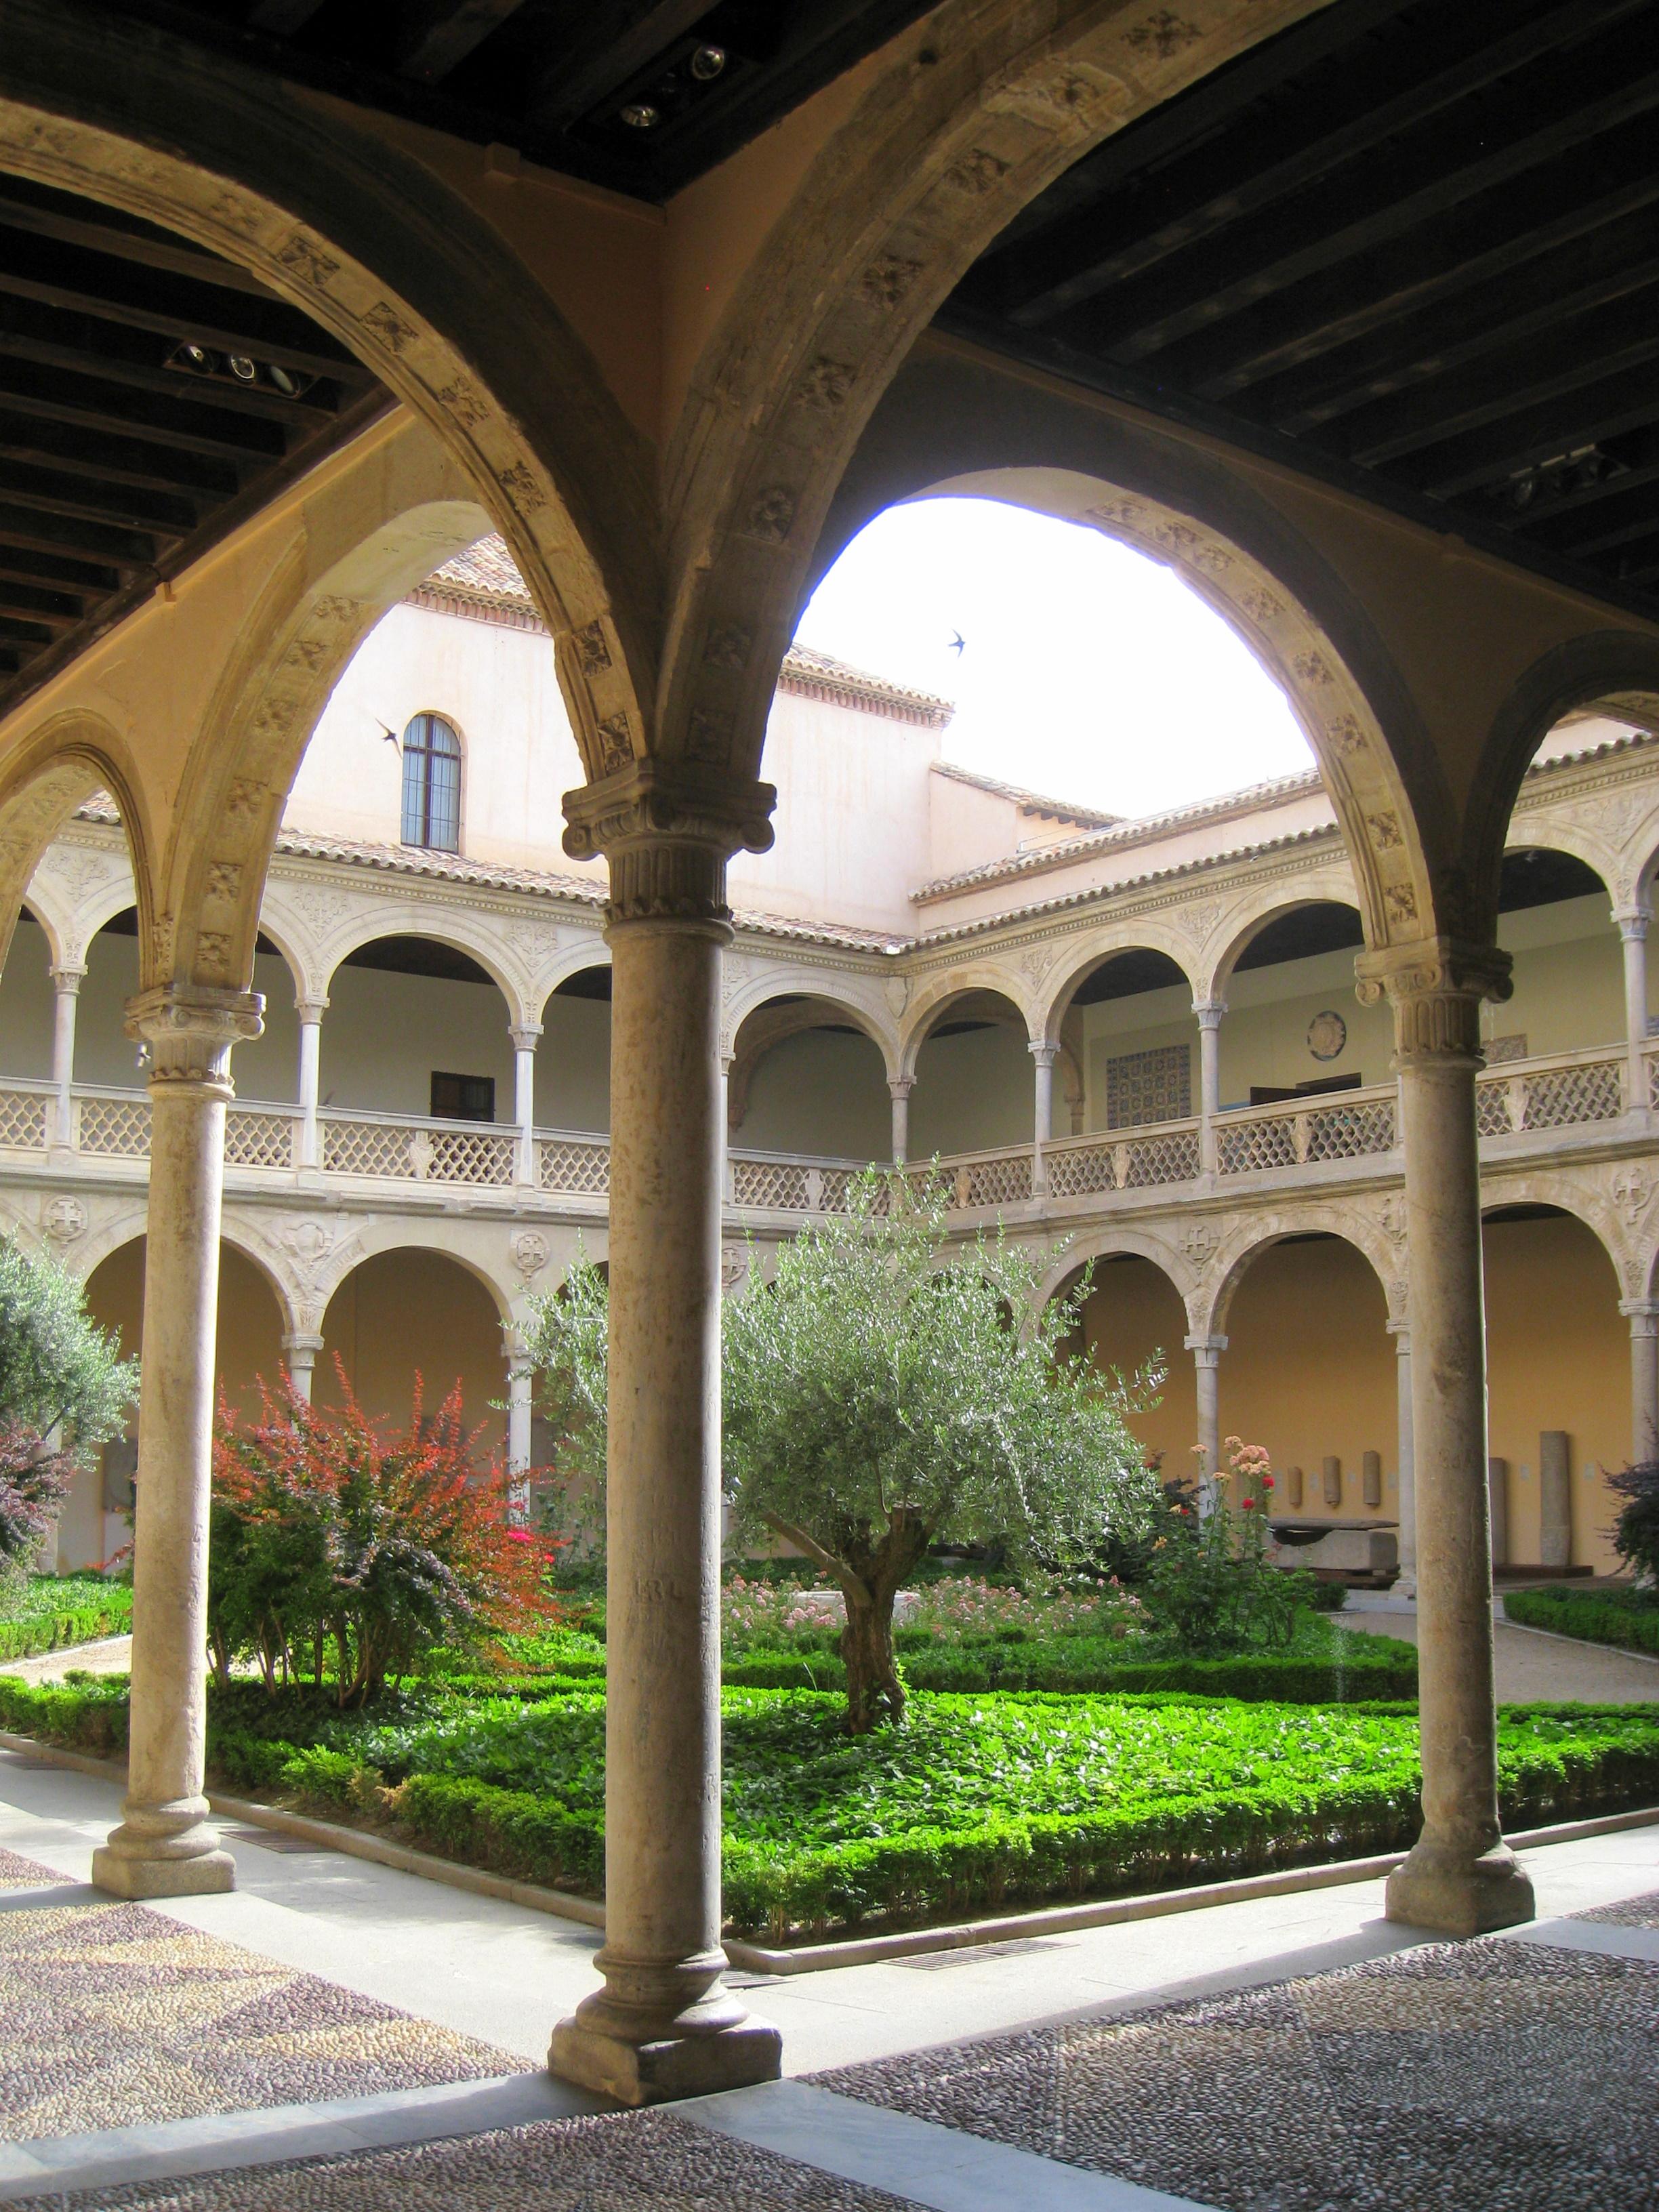 Museo De Santa Cruz.File Museo De Santa Cruz Toledo Couryard 1 Jpg Wikimedia Commons